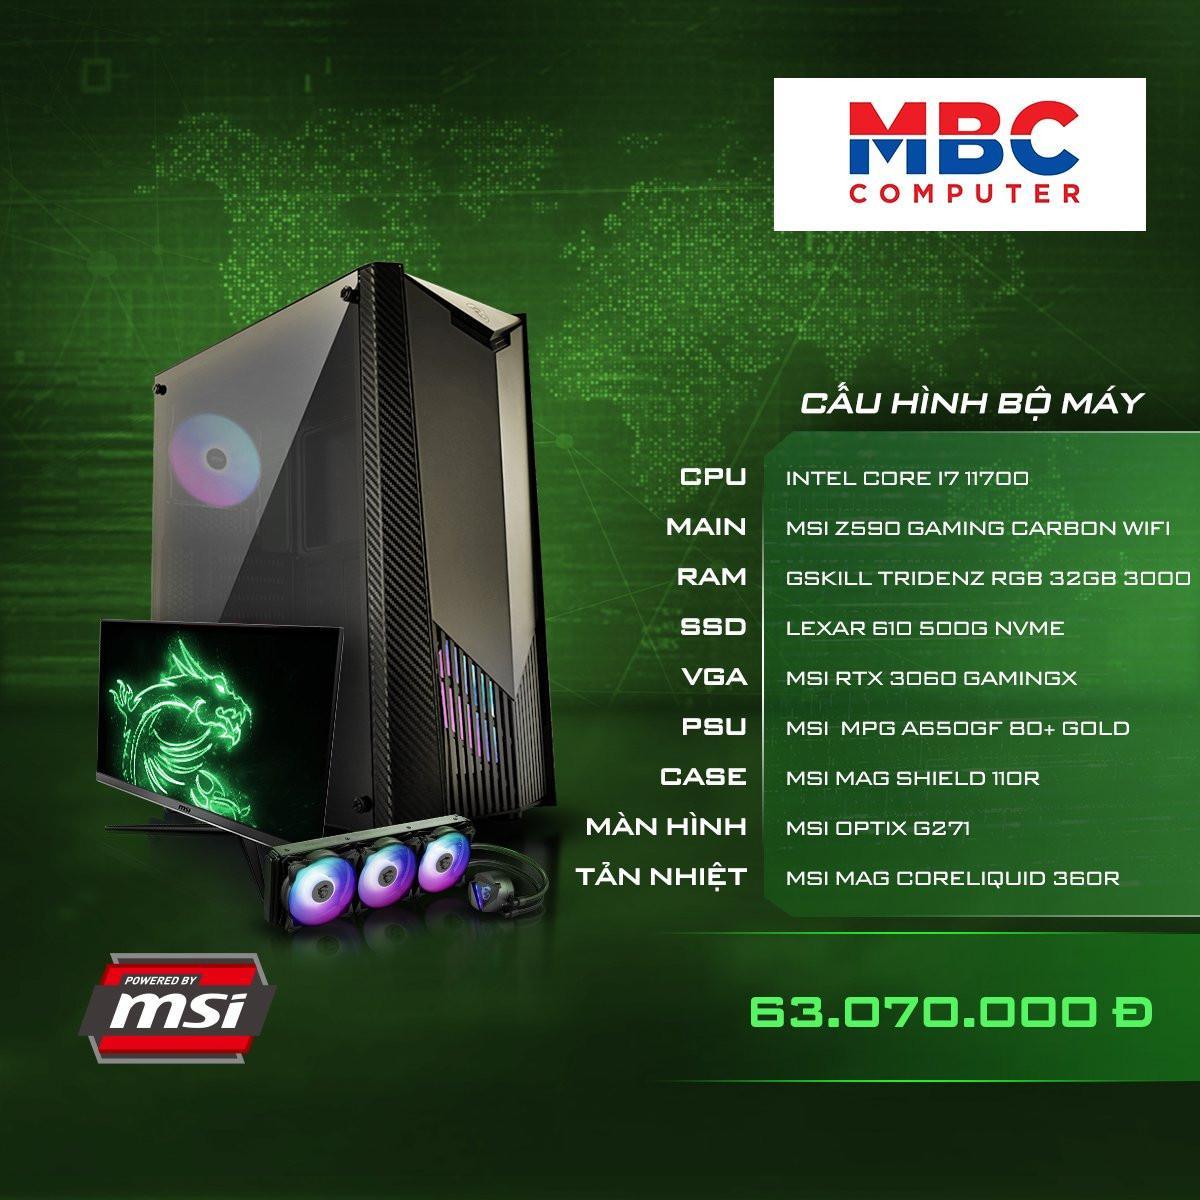 PC GAMING (Z590/I7 11700/RAM 32GB/SSD 500GB NVM/VGA 3060)